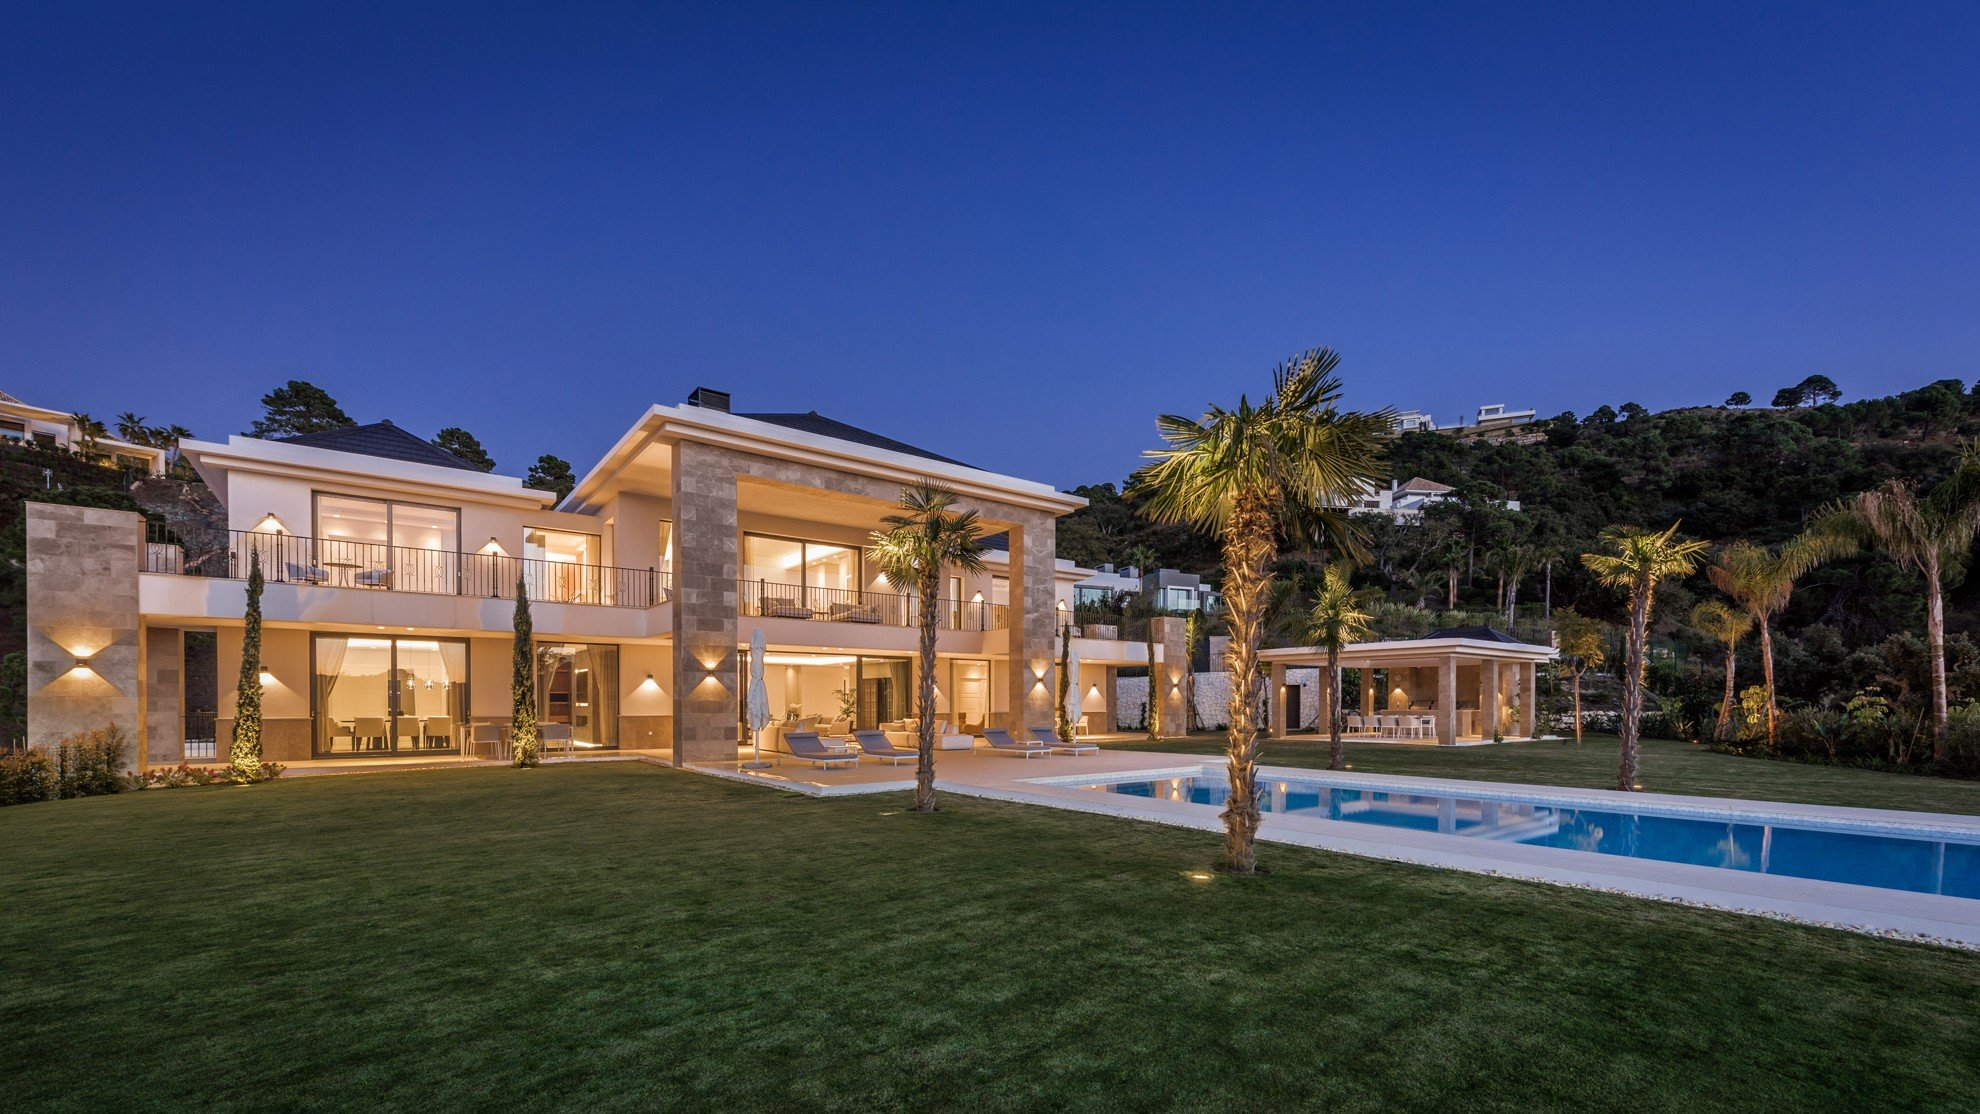 7 Bedroom 7 Bathroom Villa For Sale In La Zagaleta Benahavis Mas Property Marbella